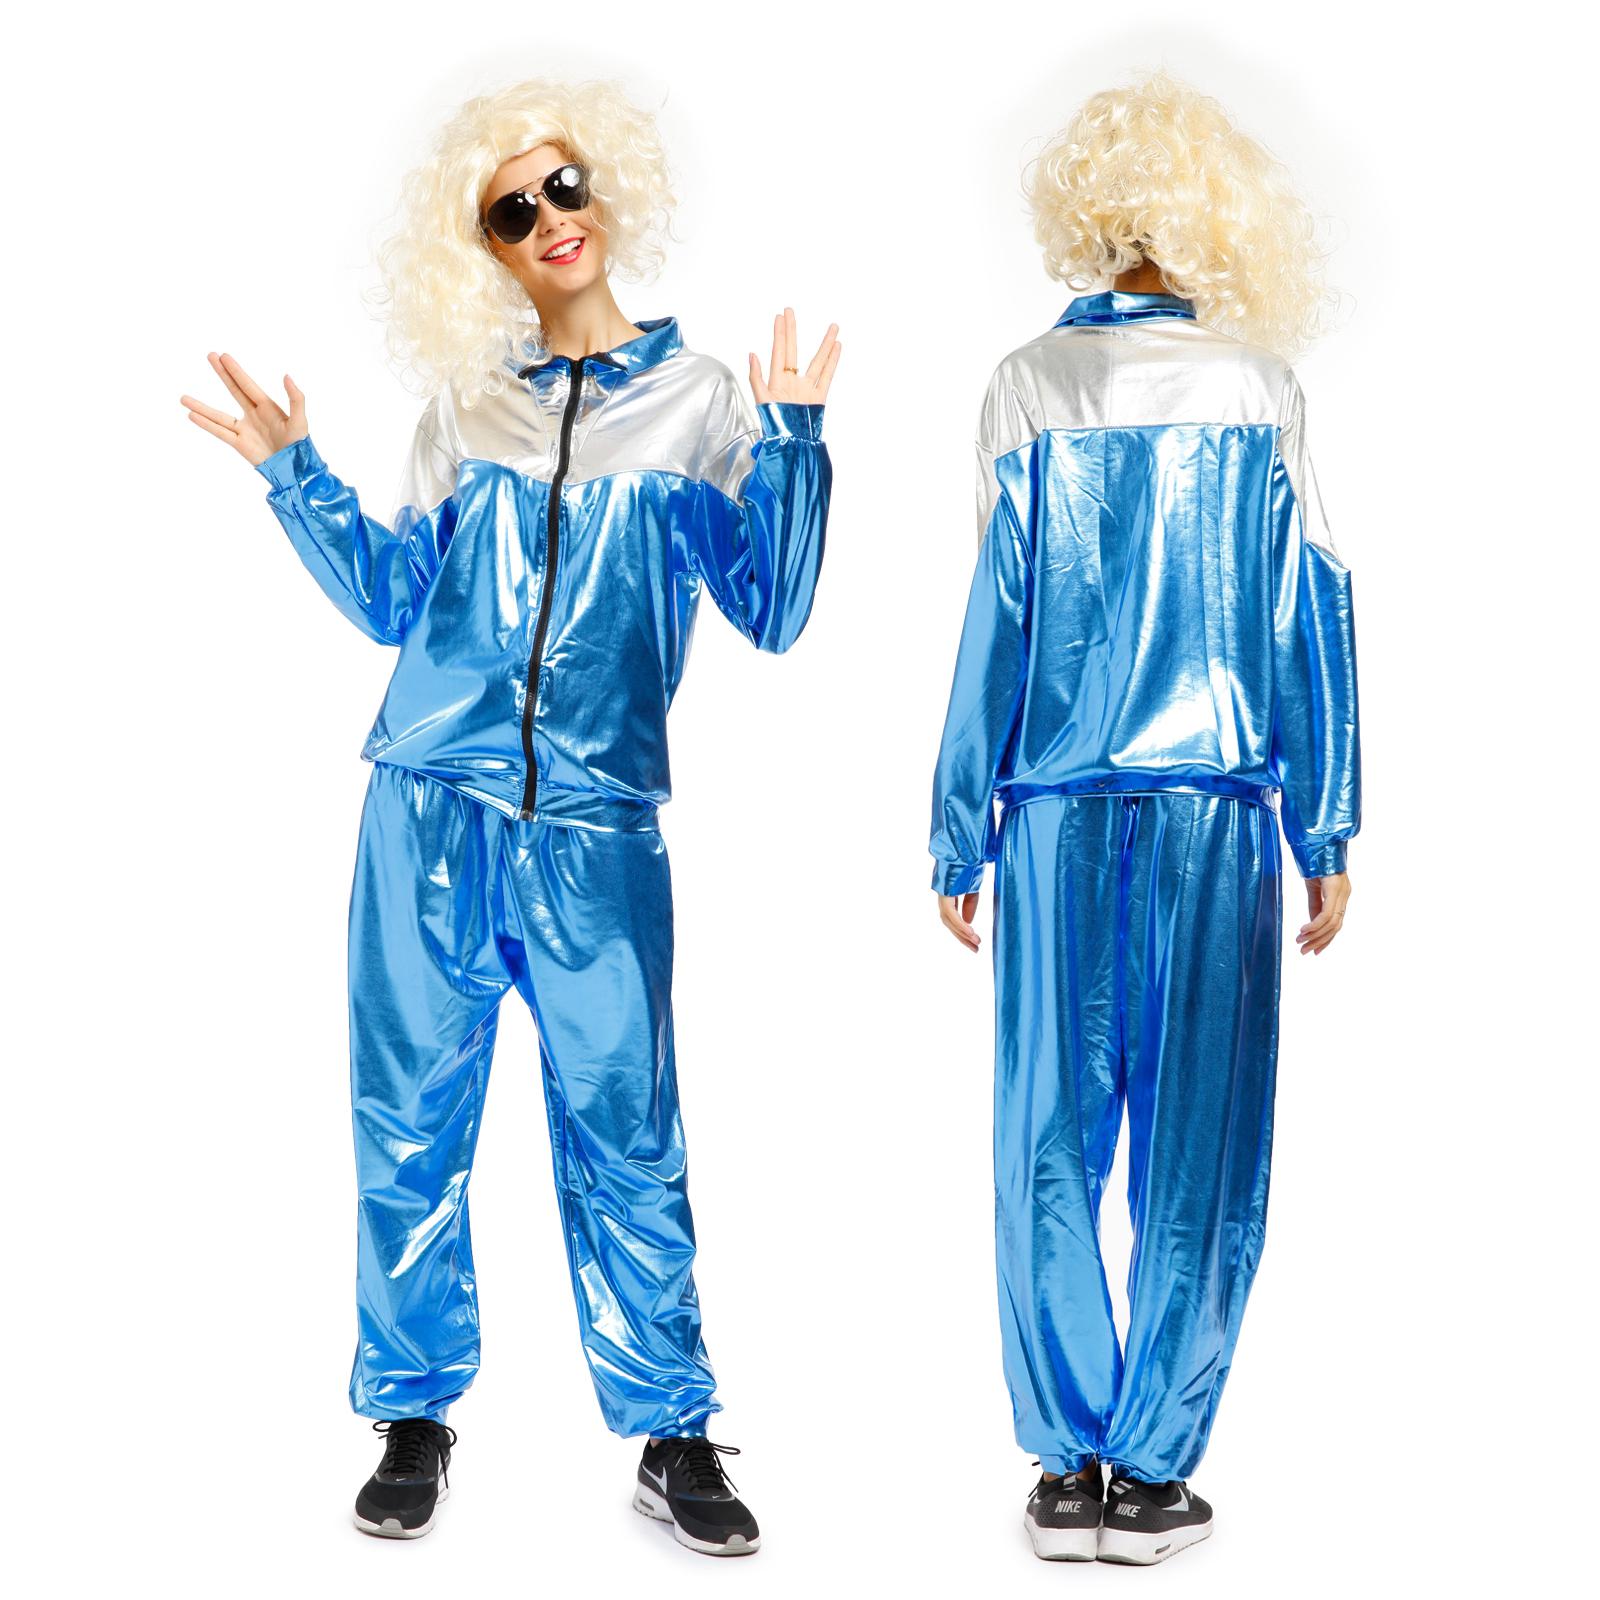 Survetement complet deguisement wetlook biton retro 80s hip hop sport breakdance ebay - Annee 80 tenue ...